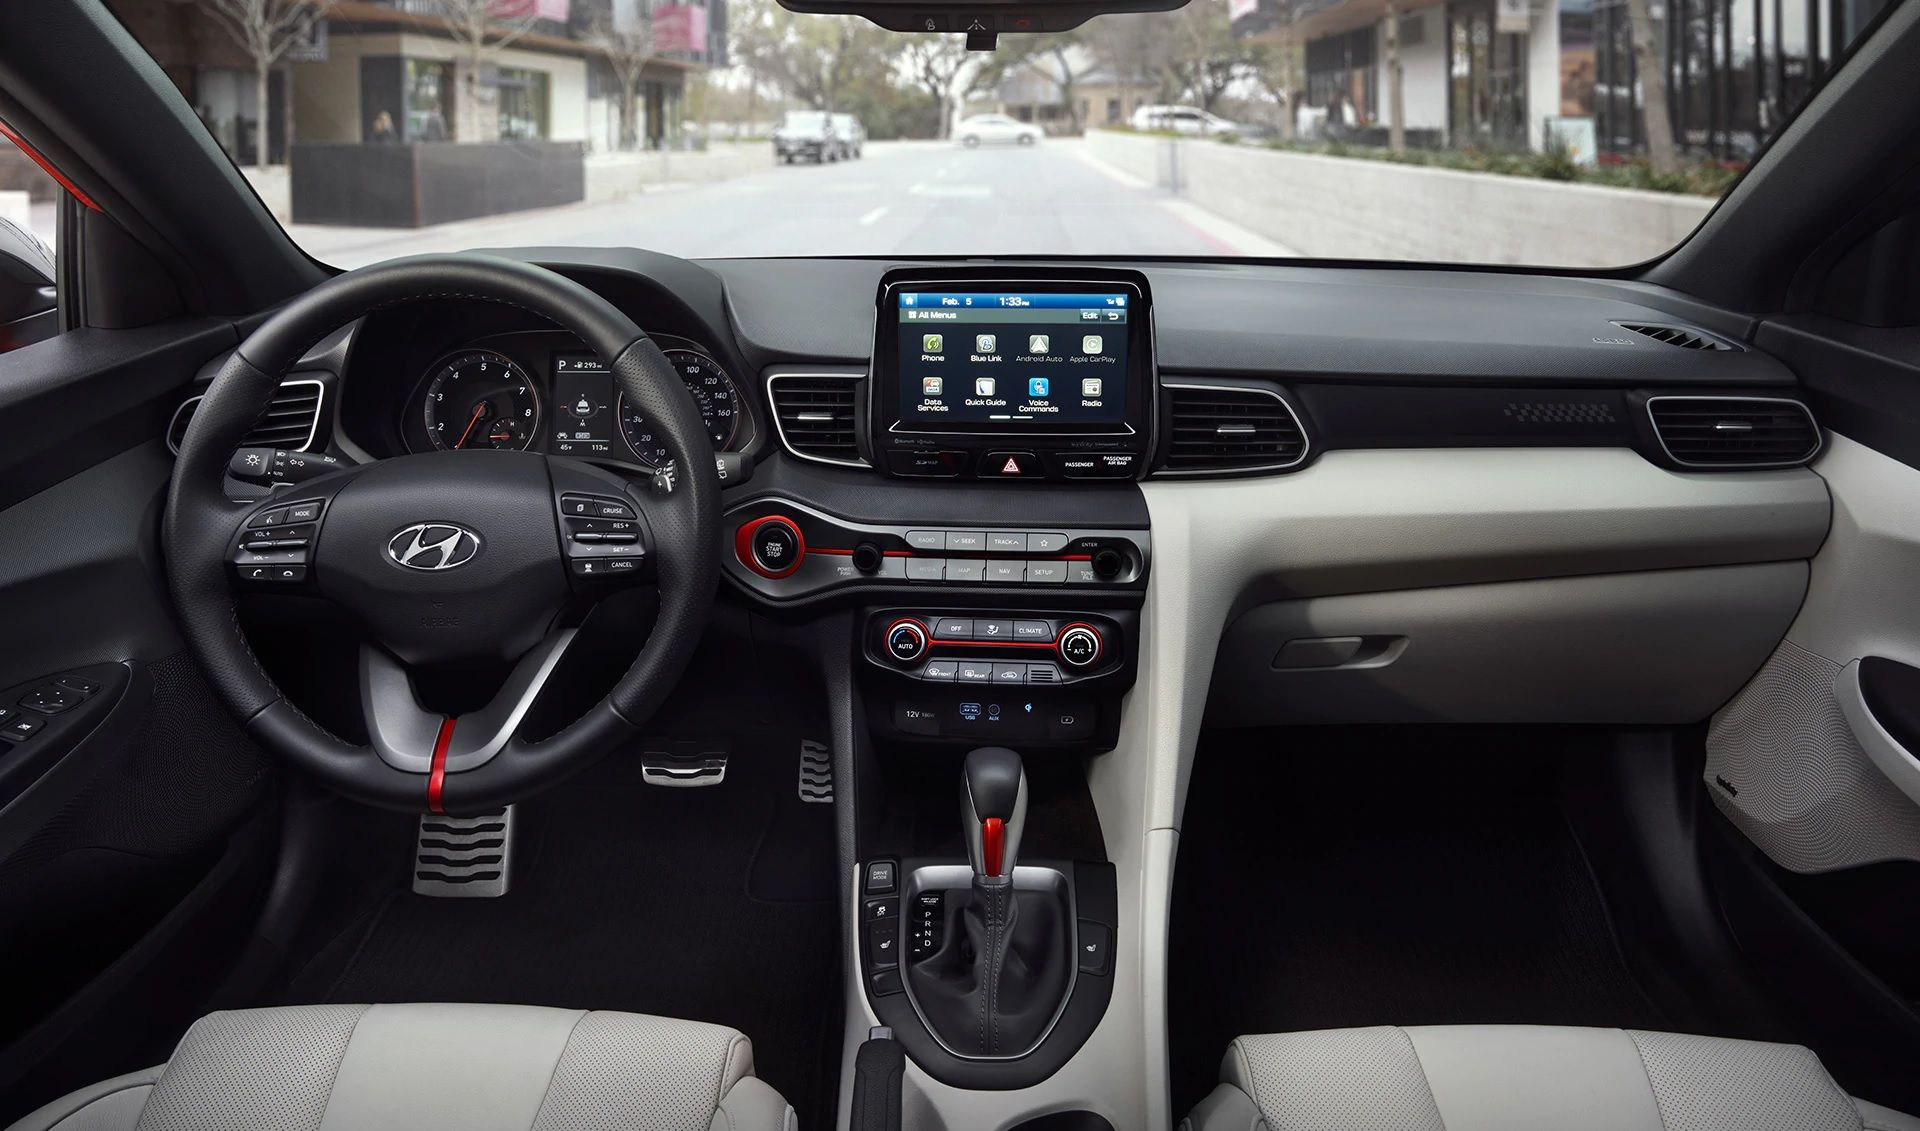 Diseño interior asimétrico del Hyundai Veloster Turbo